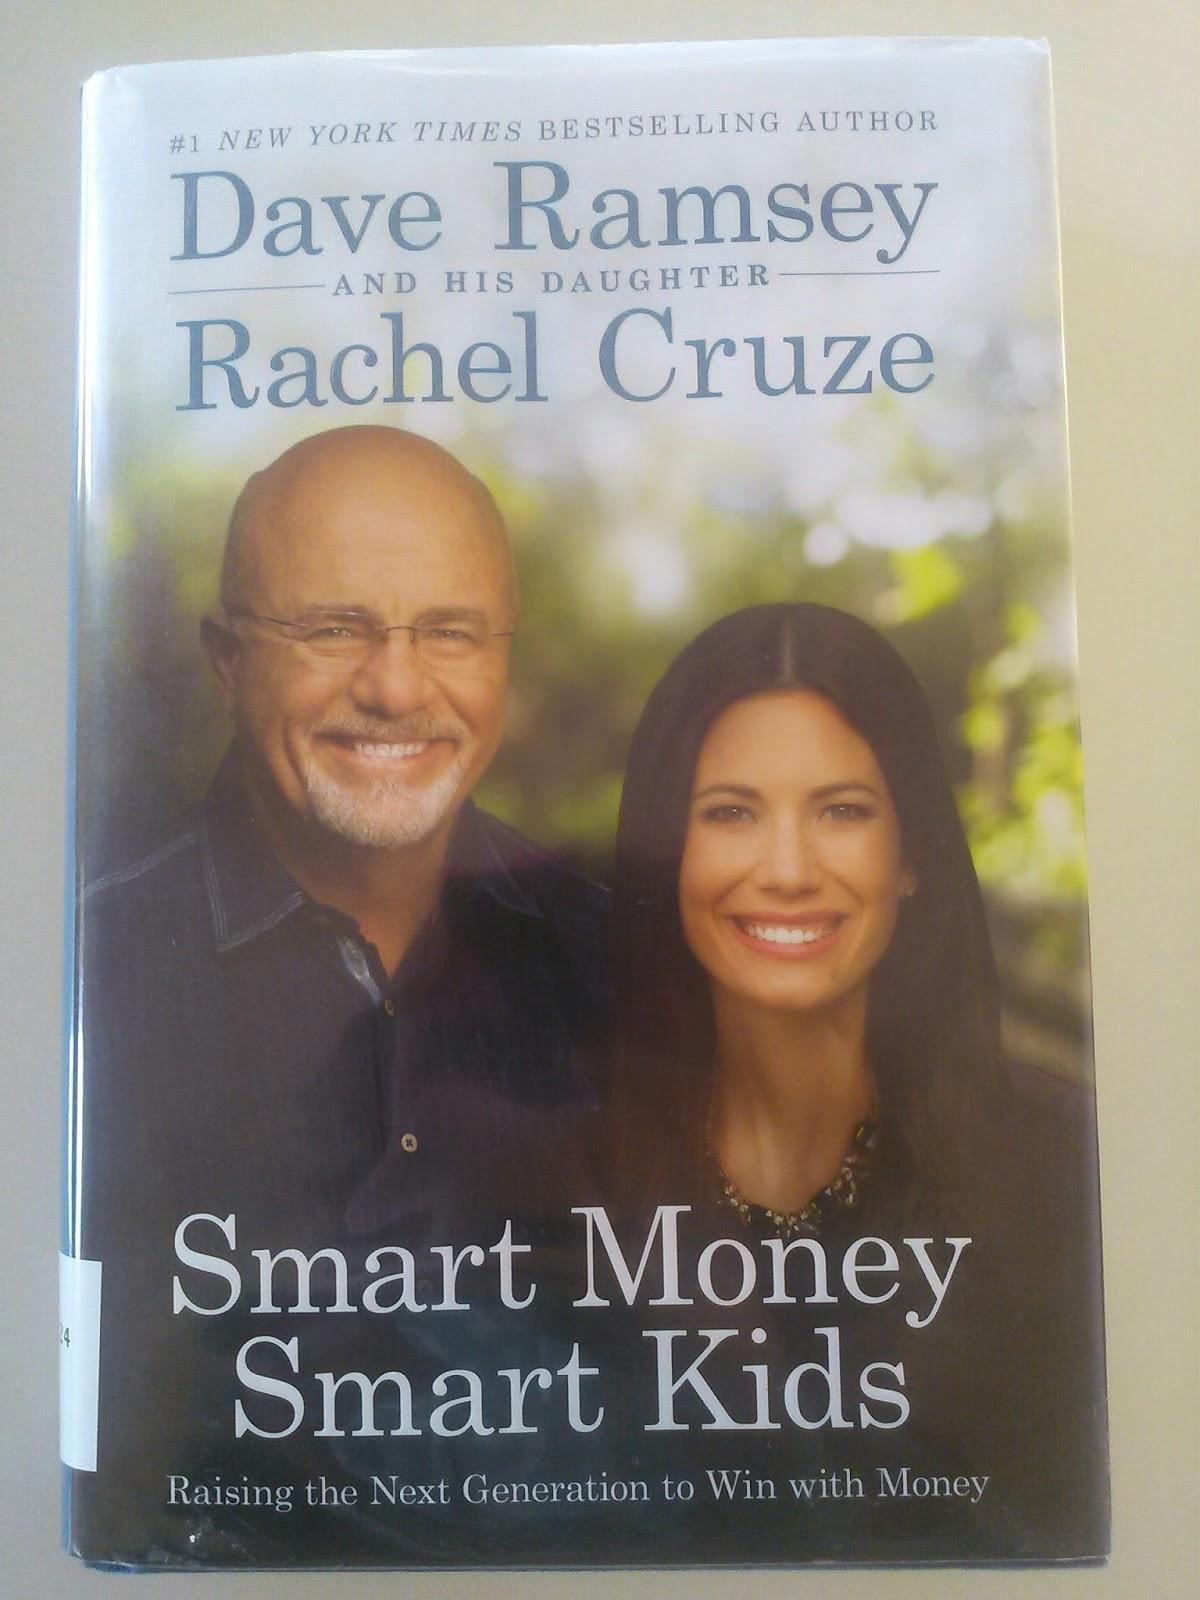 Smart Money Smart Kids by Dave Ramsey and Rachel Cruze  l  Love.Bake.Read